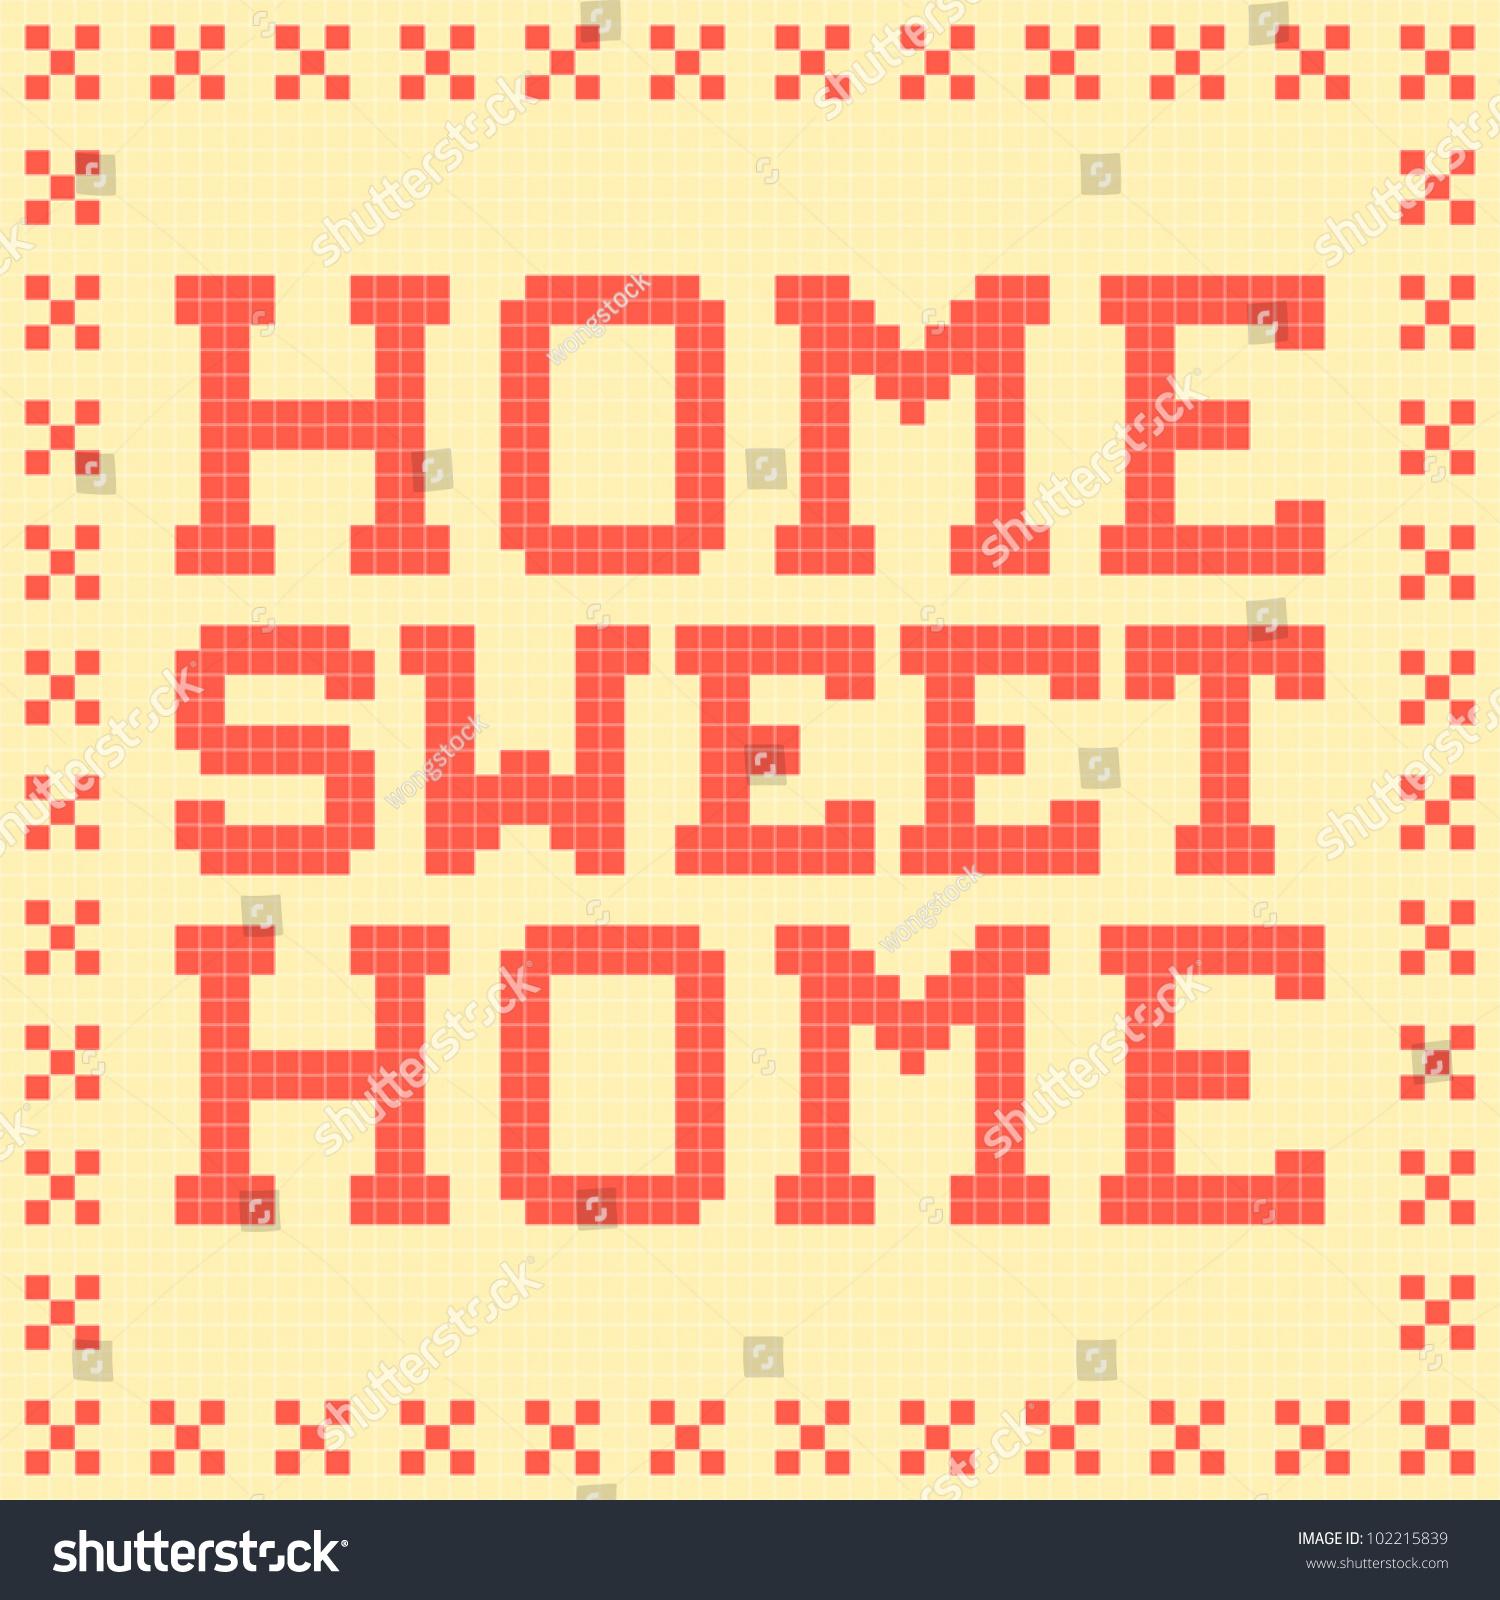 8bit pixelart home sweet home mat stock vector 102215839 shutterstock. Black Bedroom Furniture Sets. Home Design Ideas